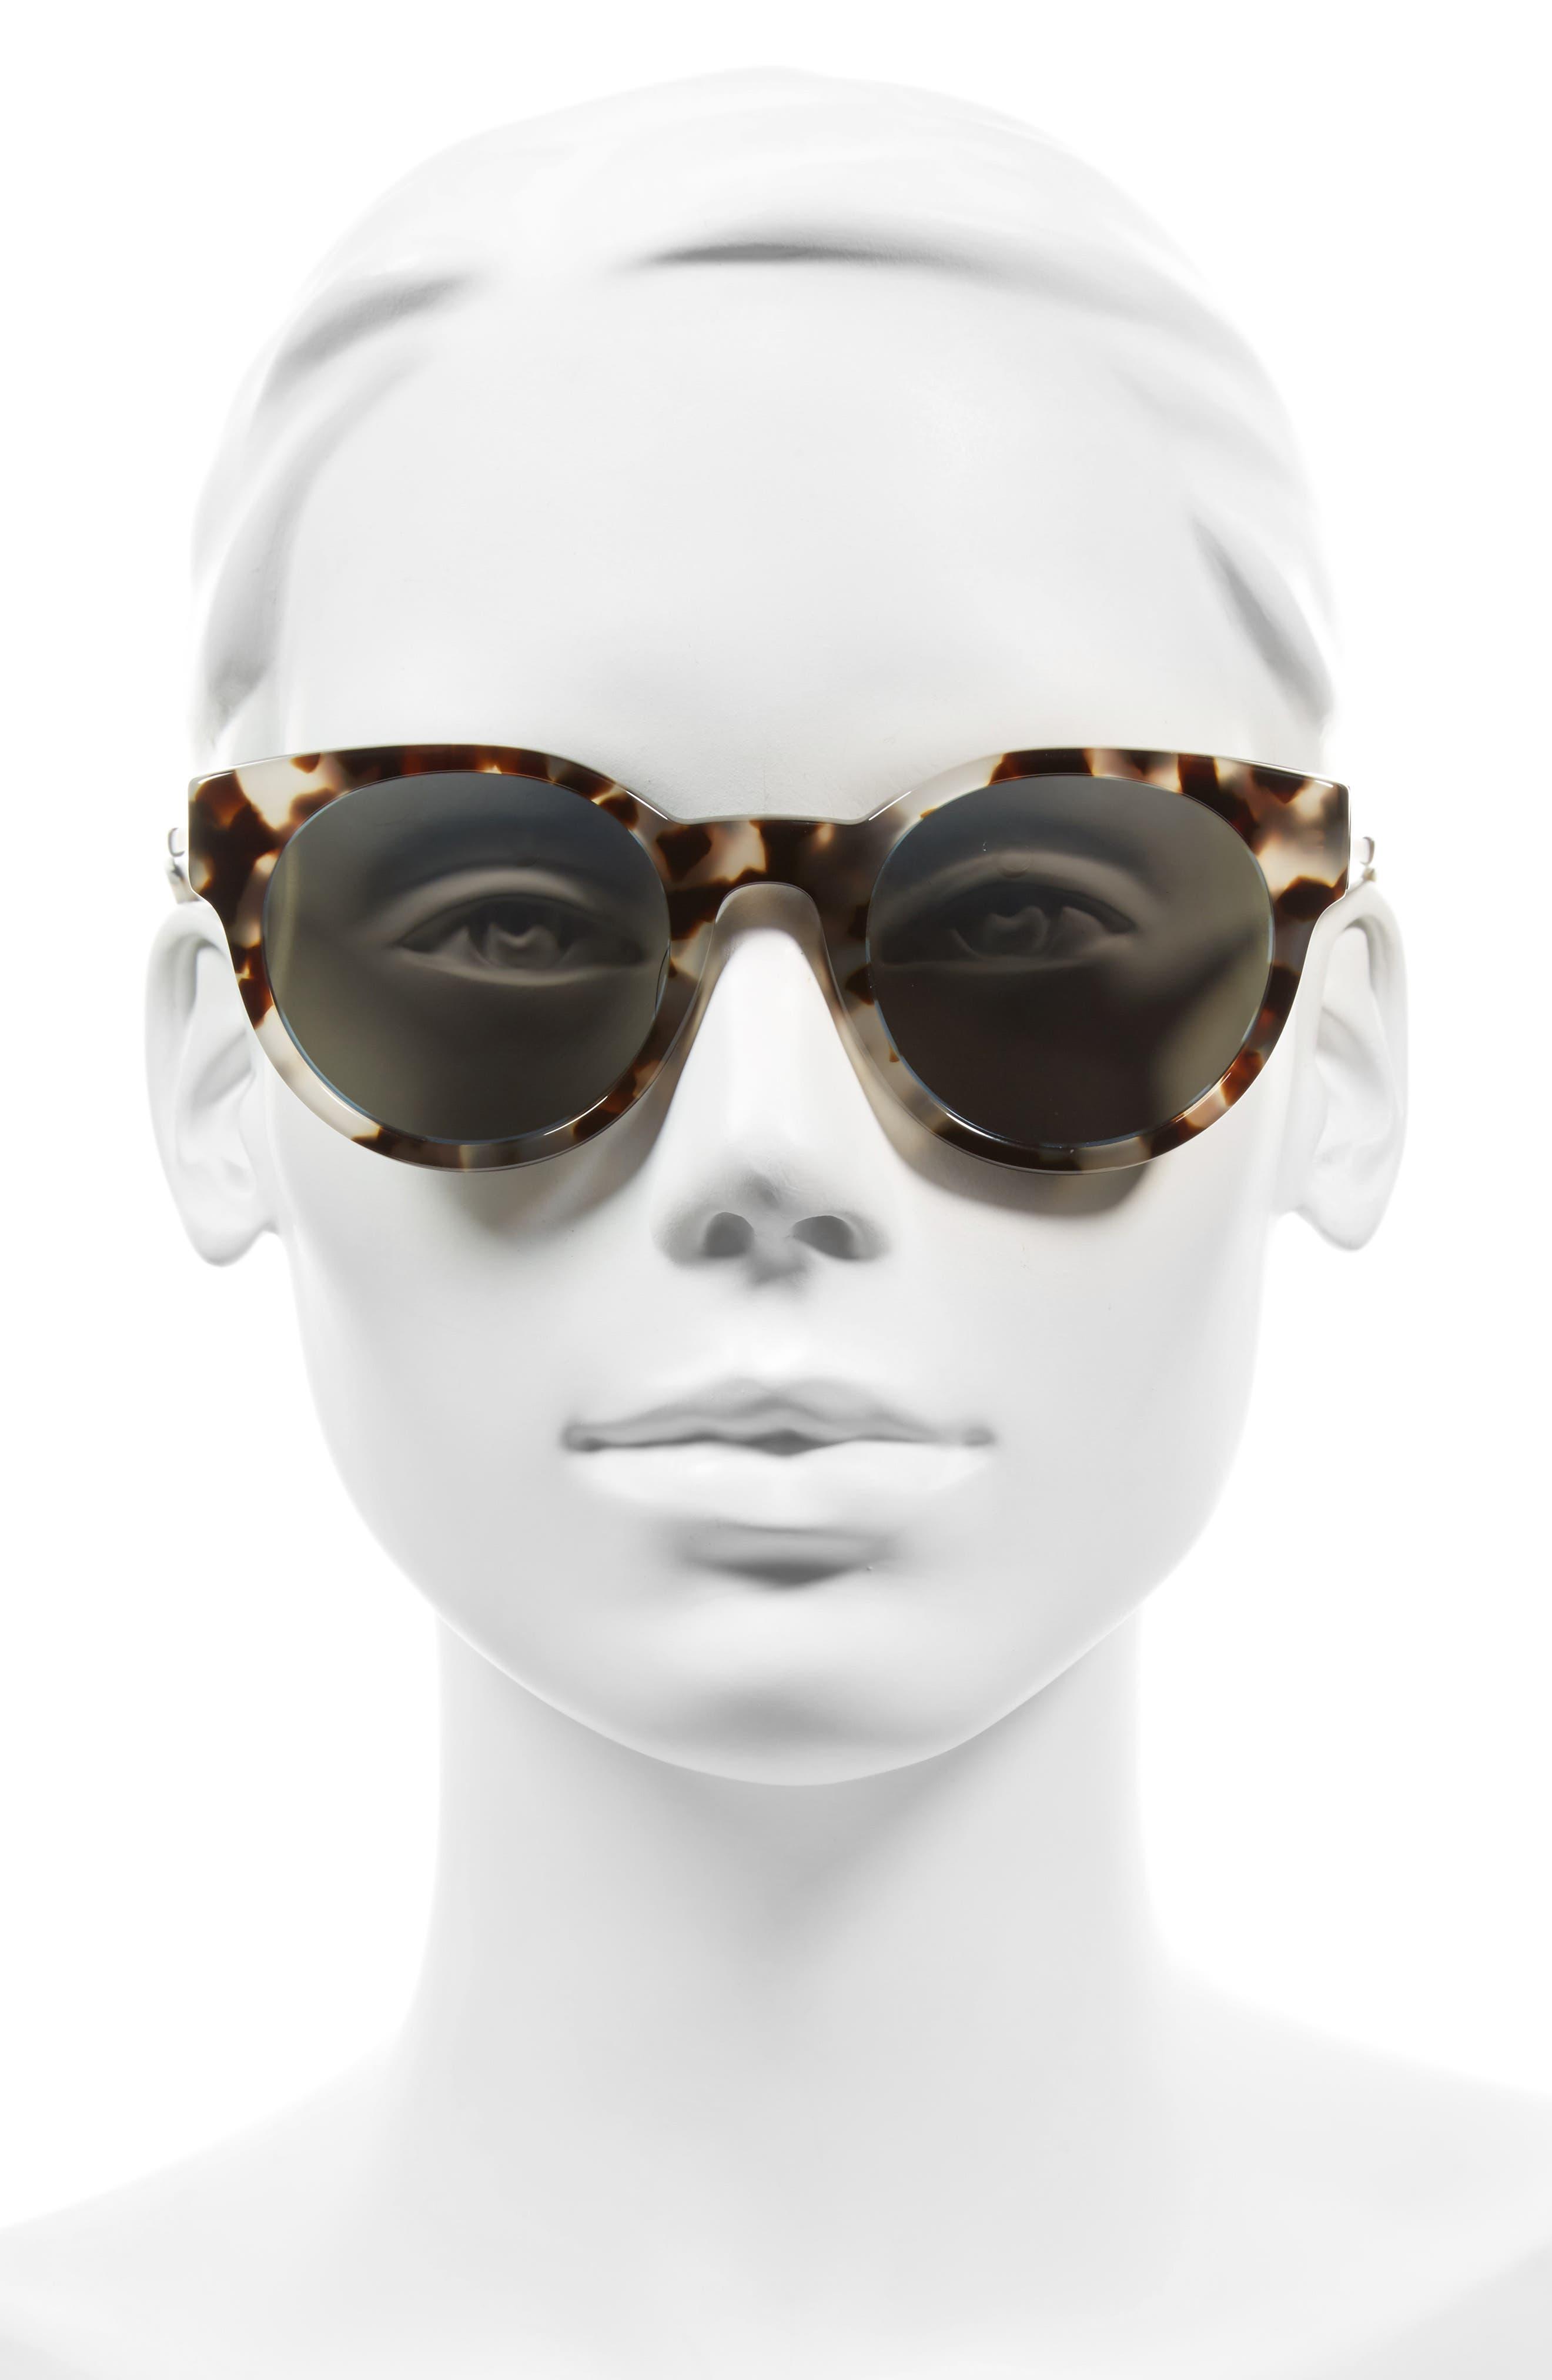 Houston 49mm Polarized Round Sunglasses,                             Alternate thumbnail 2, color,                             BISQUE HAVANA/ BLUE MIRROR